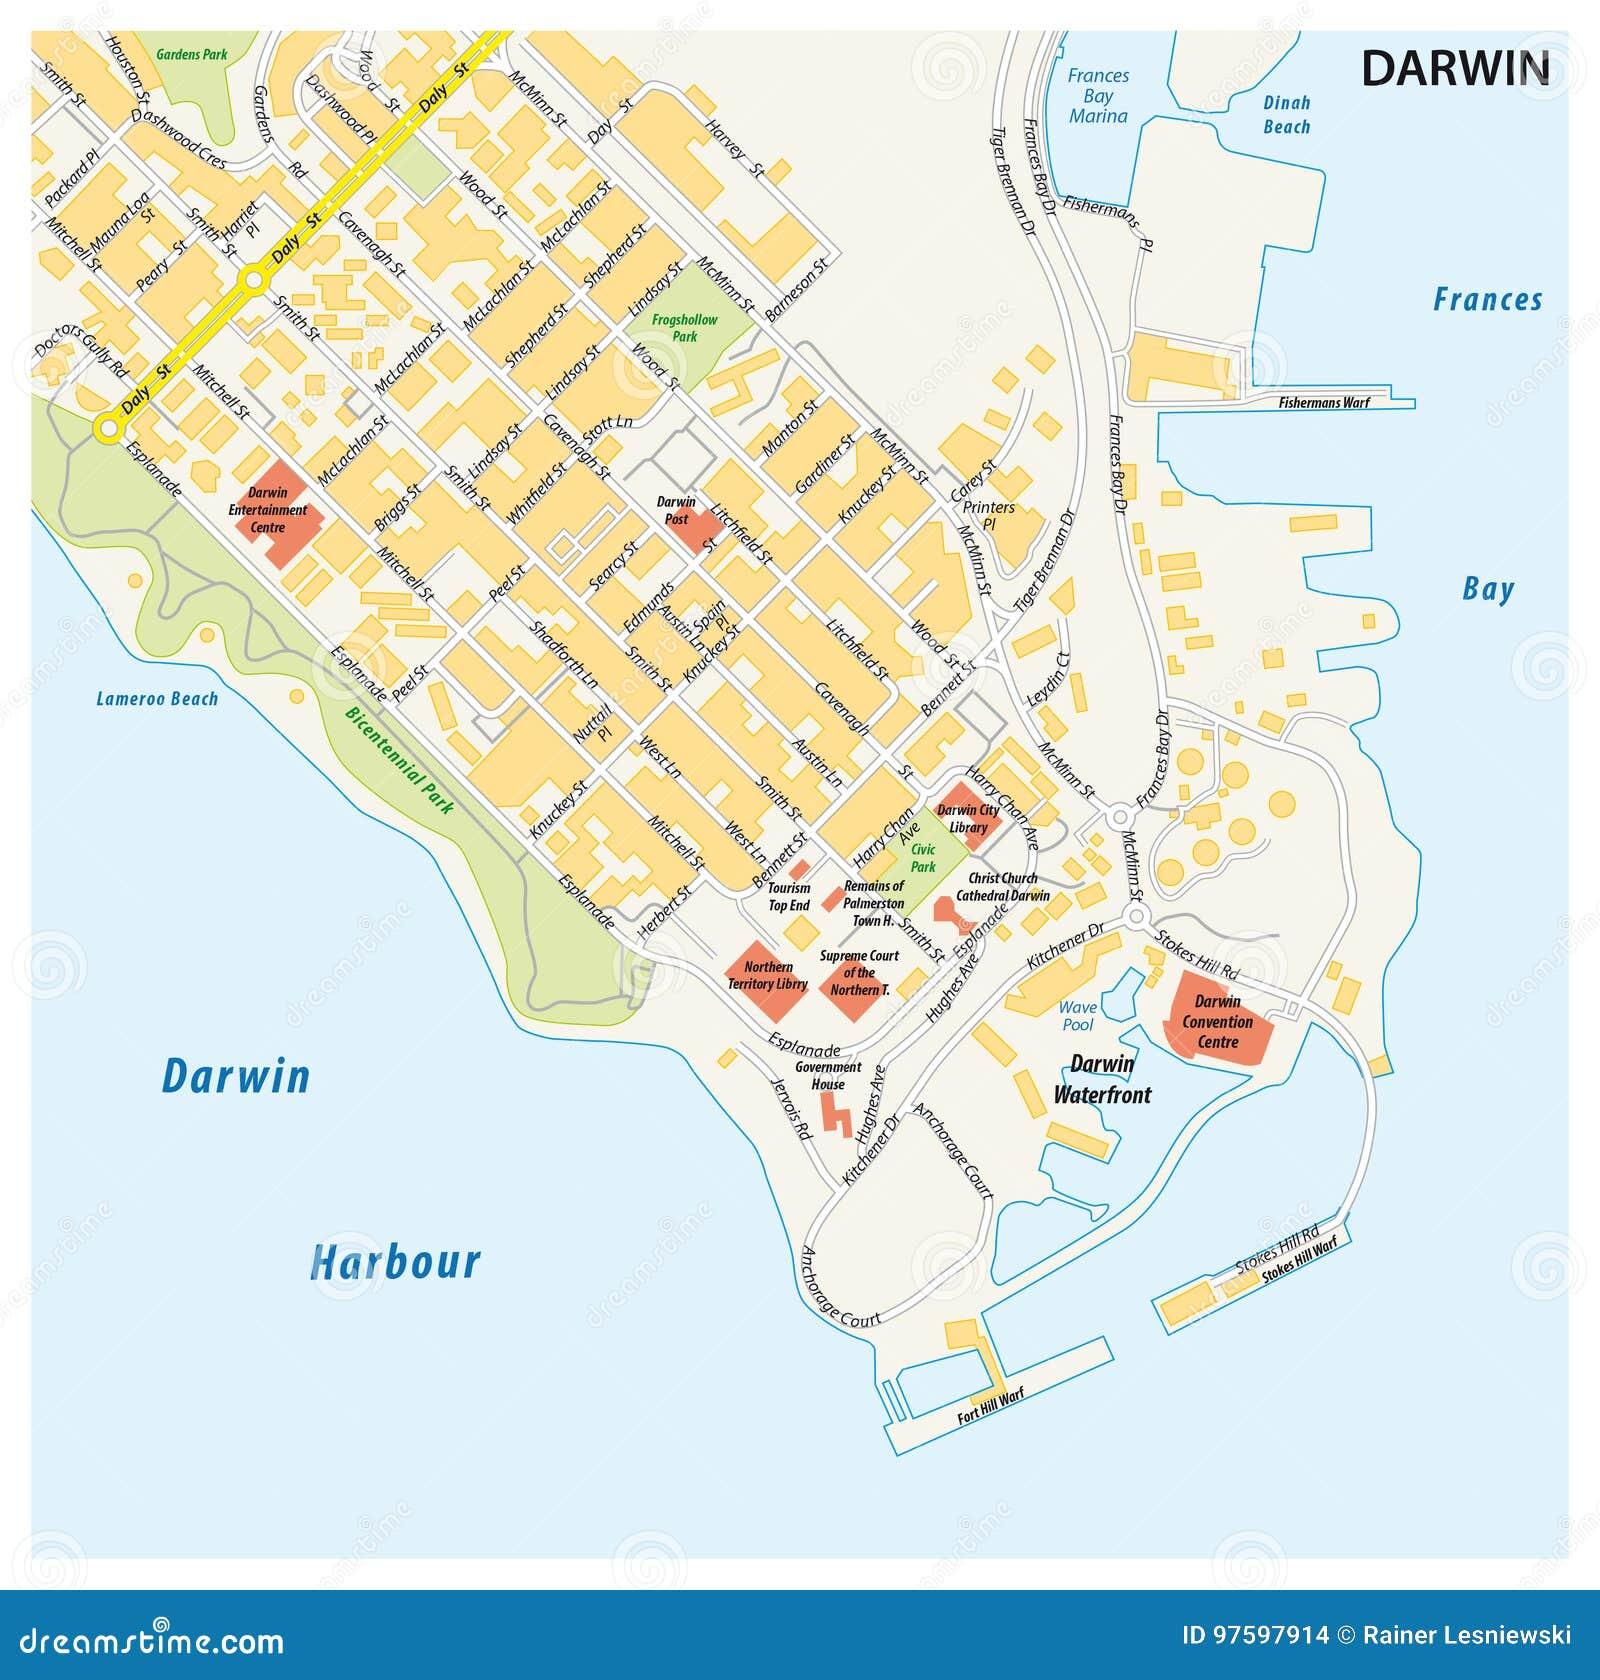 Northern Australia Map.Street Map Of The City Of Darwin Northern Territory Australia